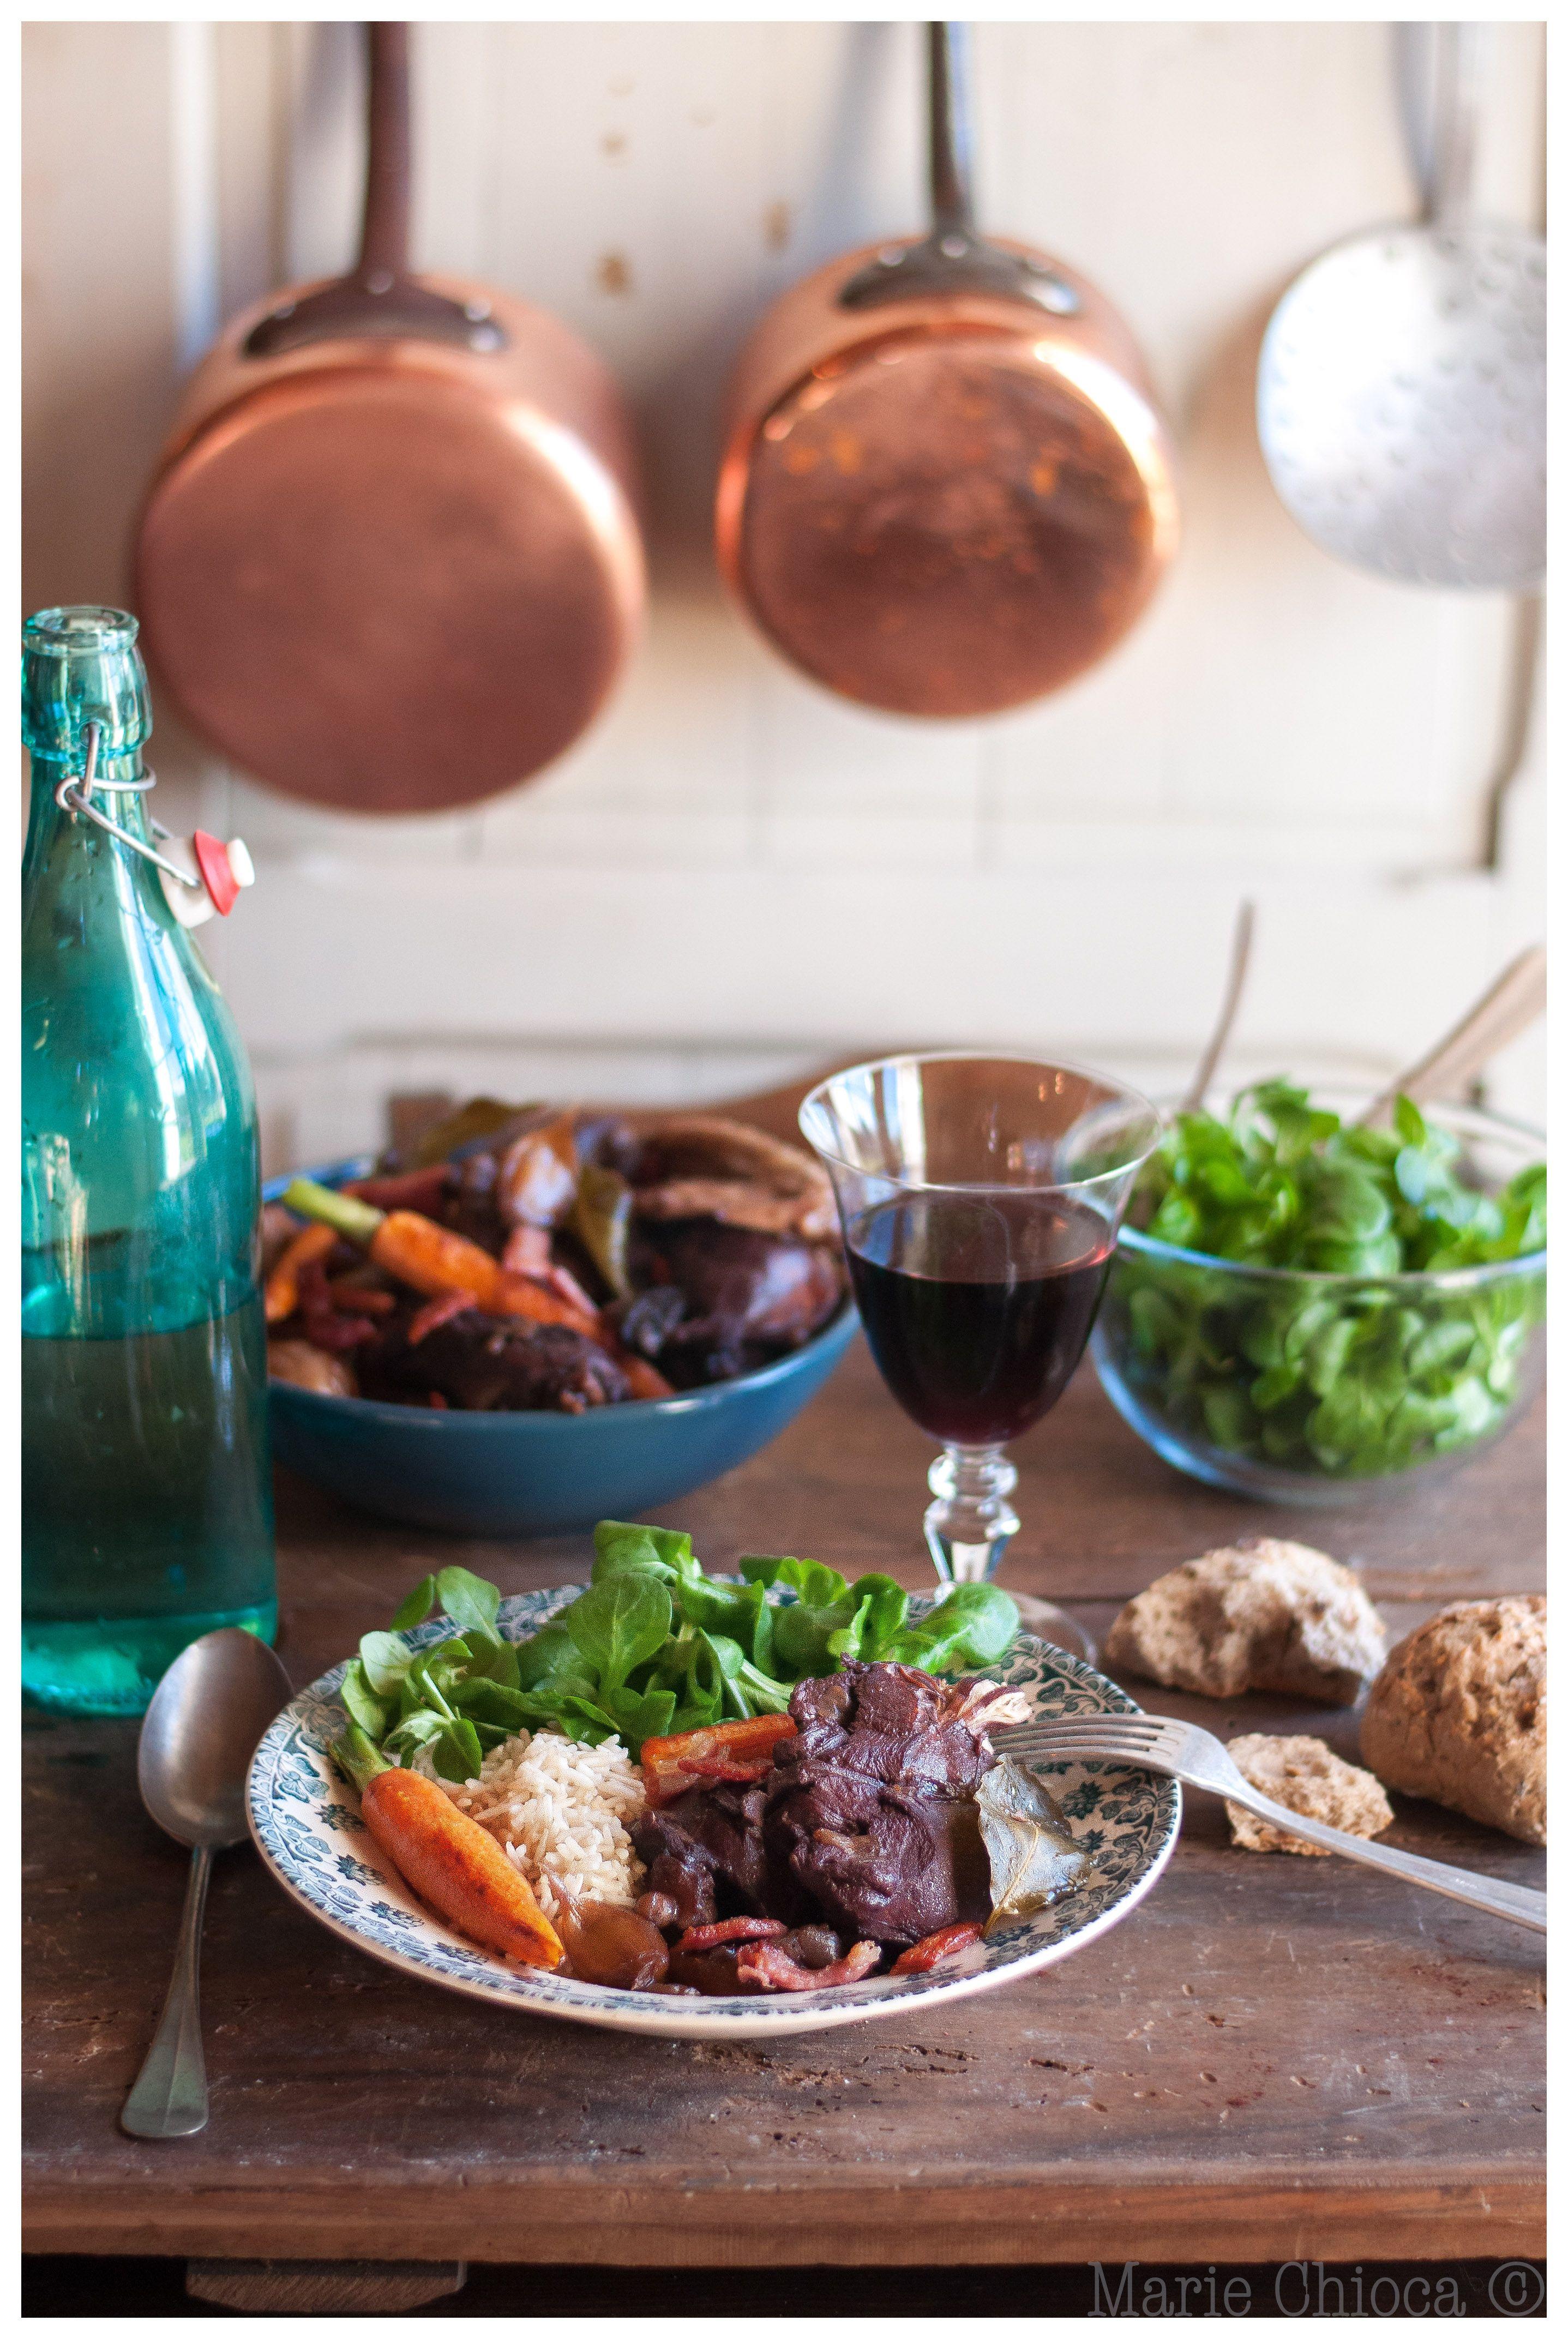 Coq au vin Saines Gourmandises